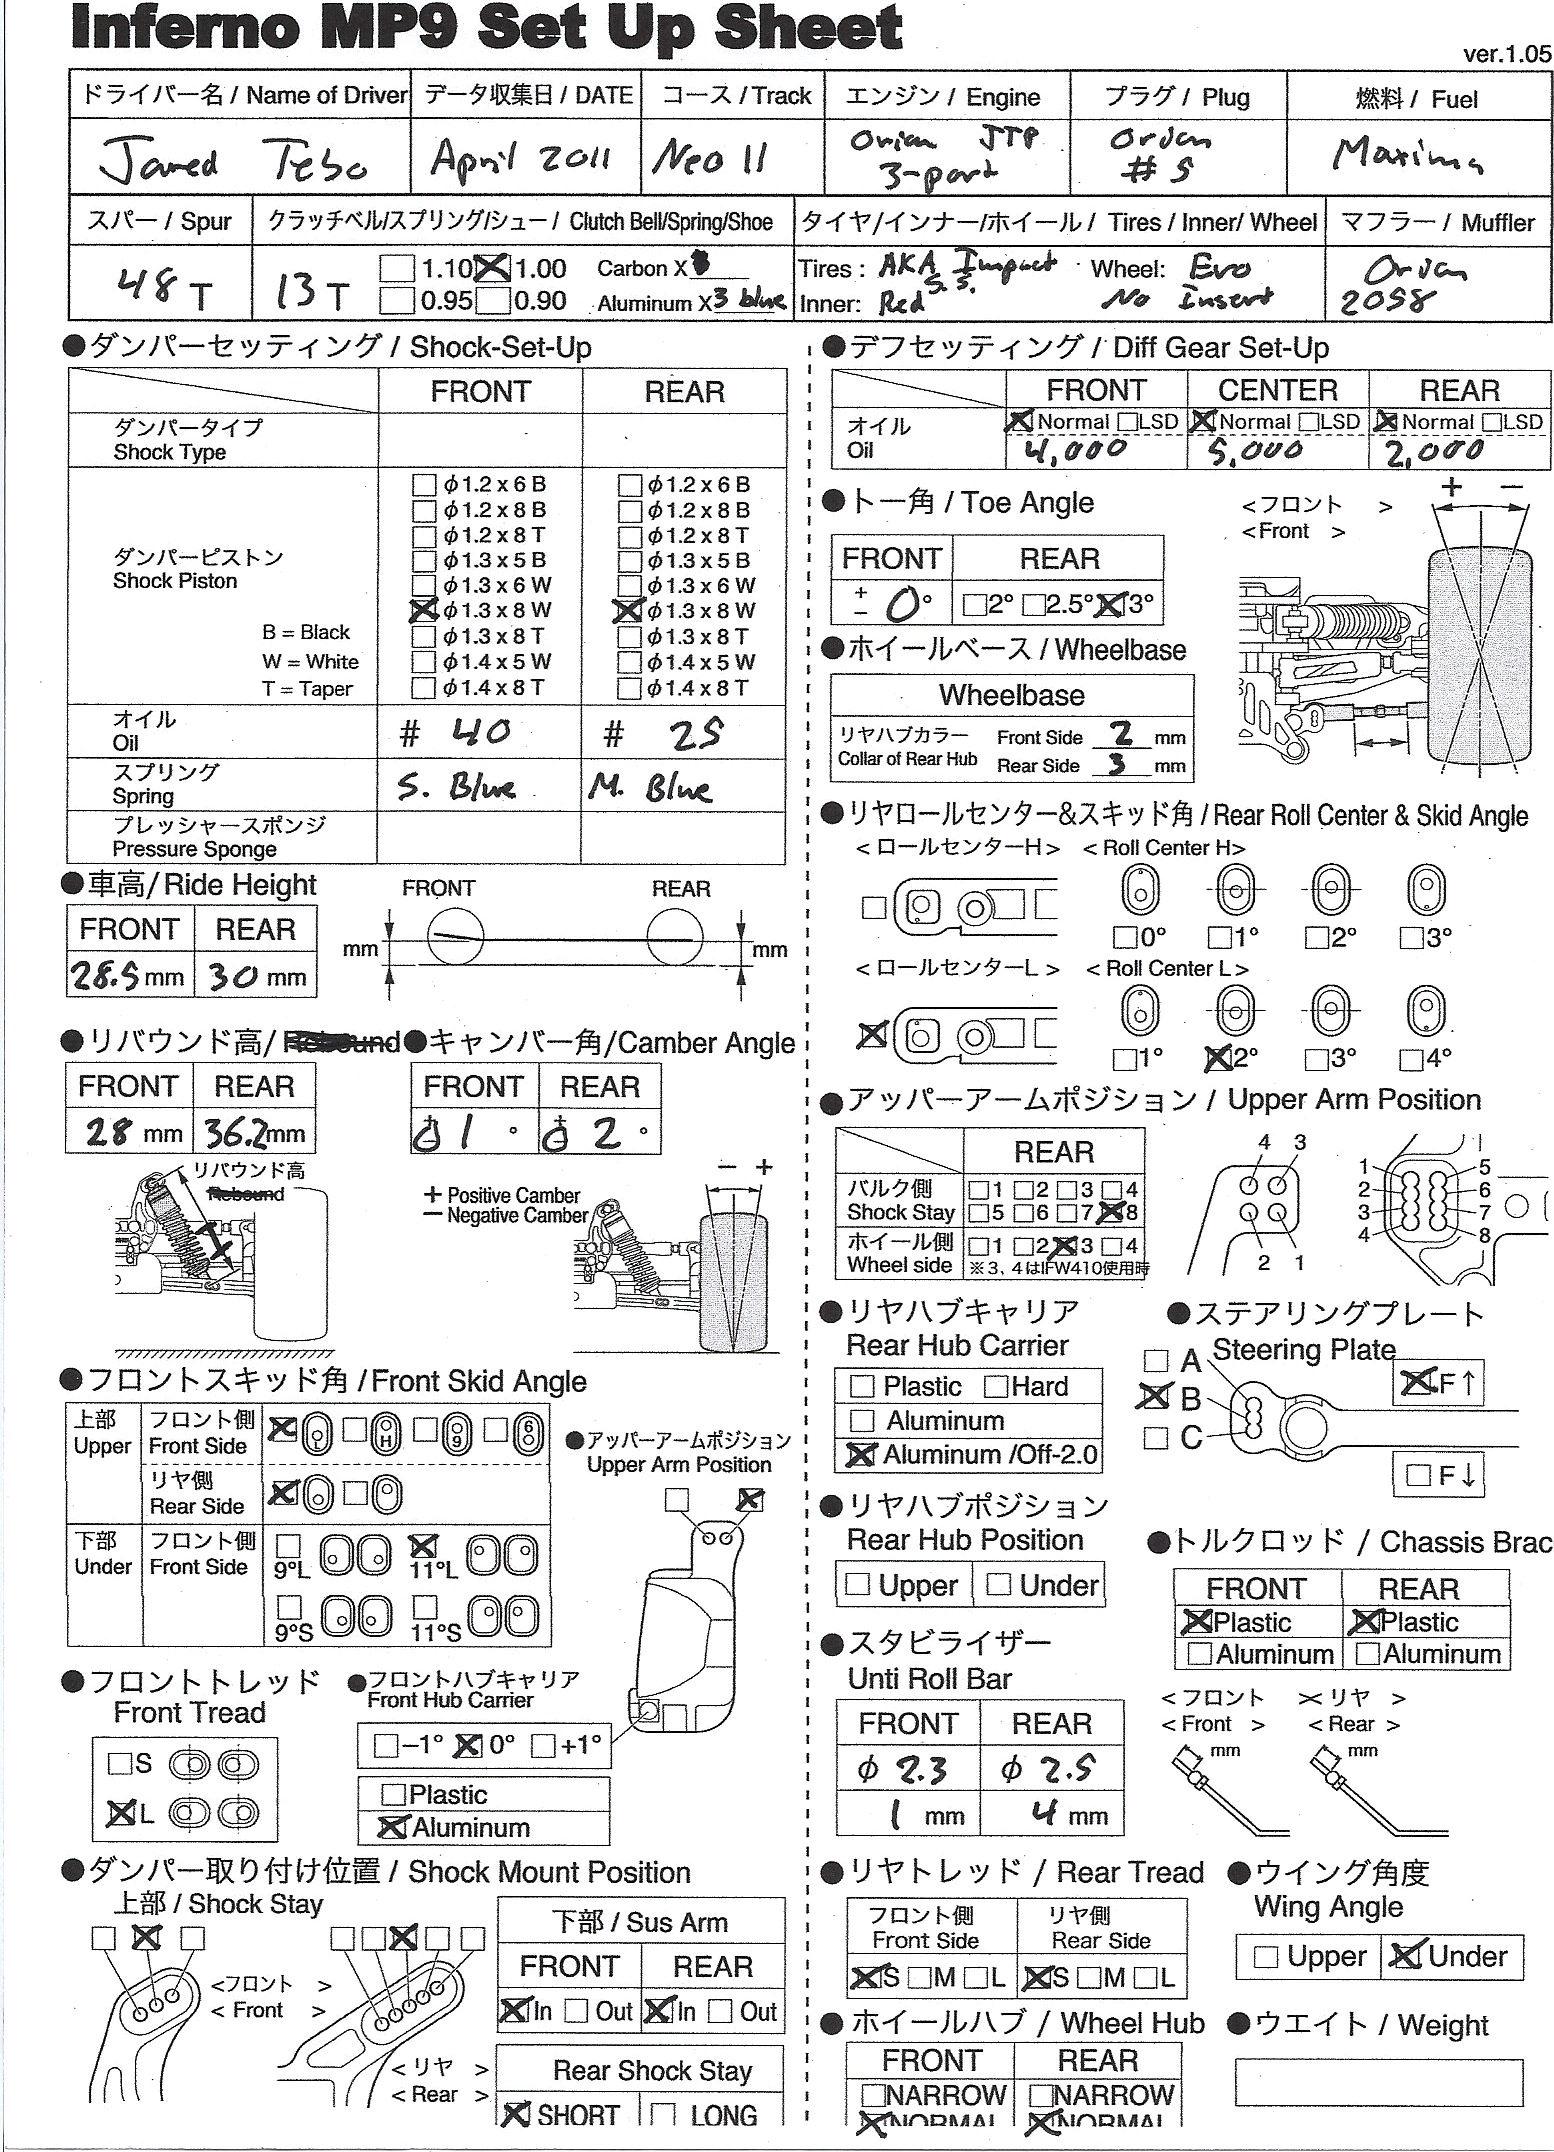 Download Kyosho Inferno GT MP7 5, MP777, MP9, Ultima and Lazer Setup